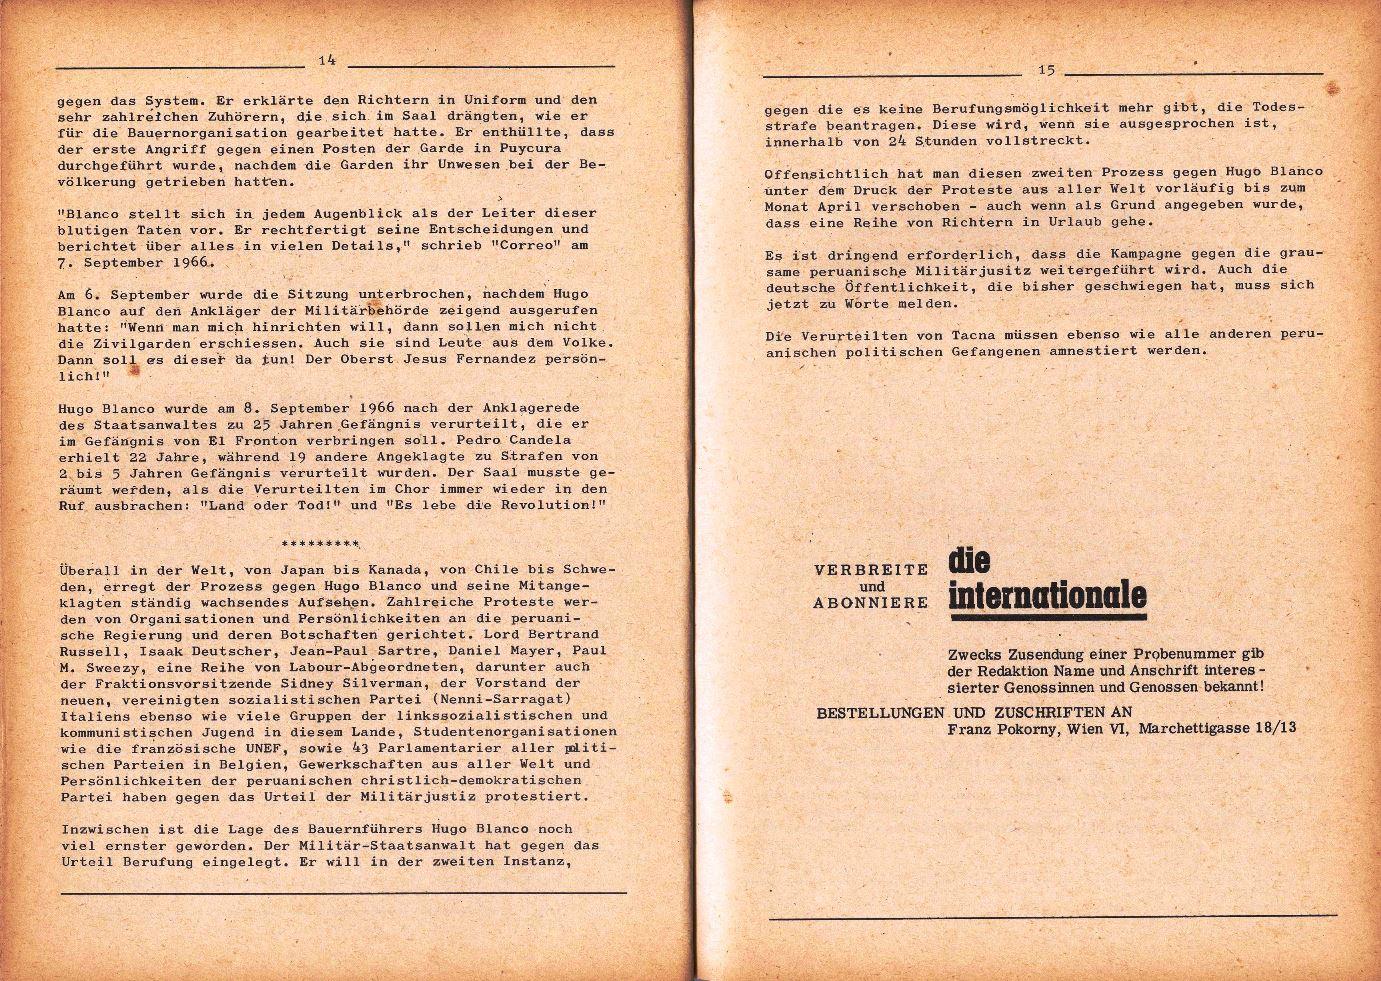 GIM_Internationale_450